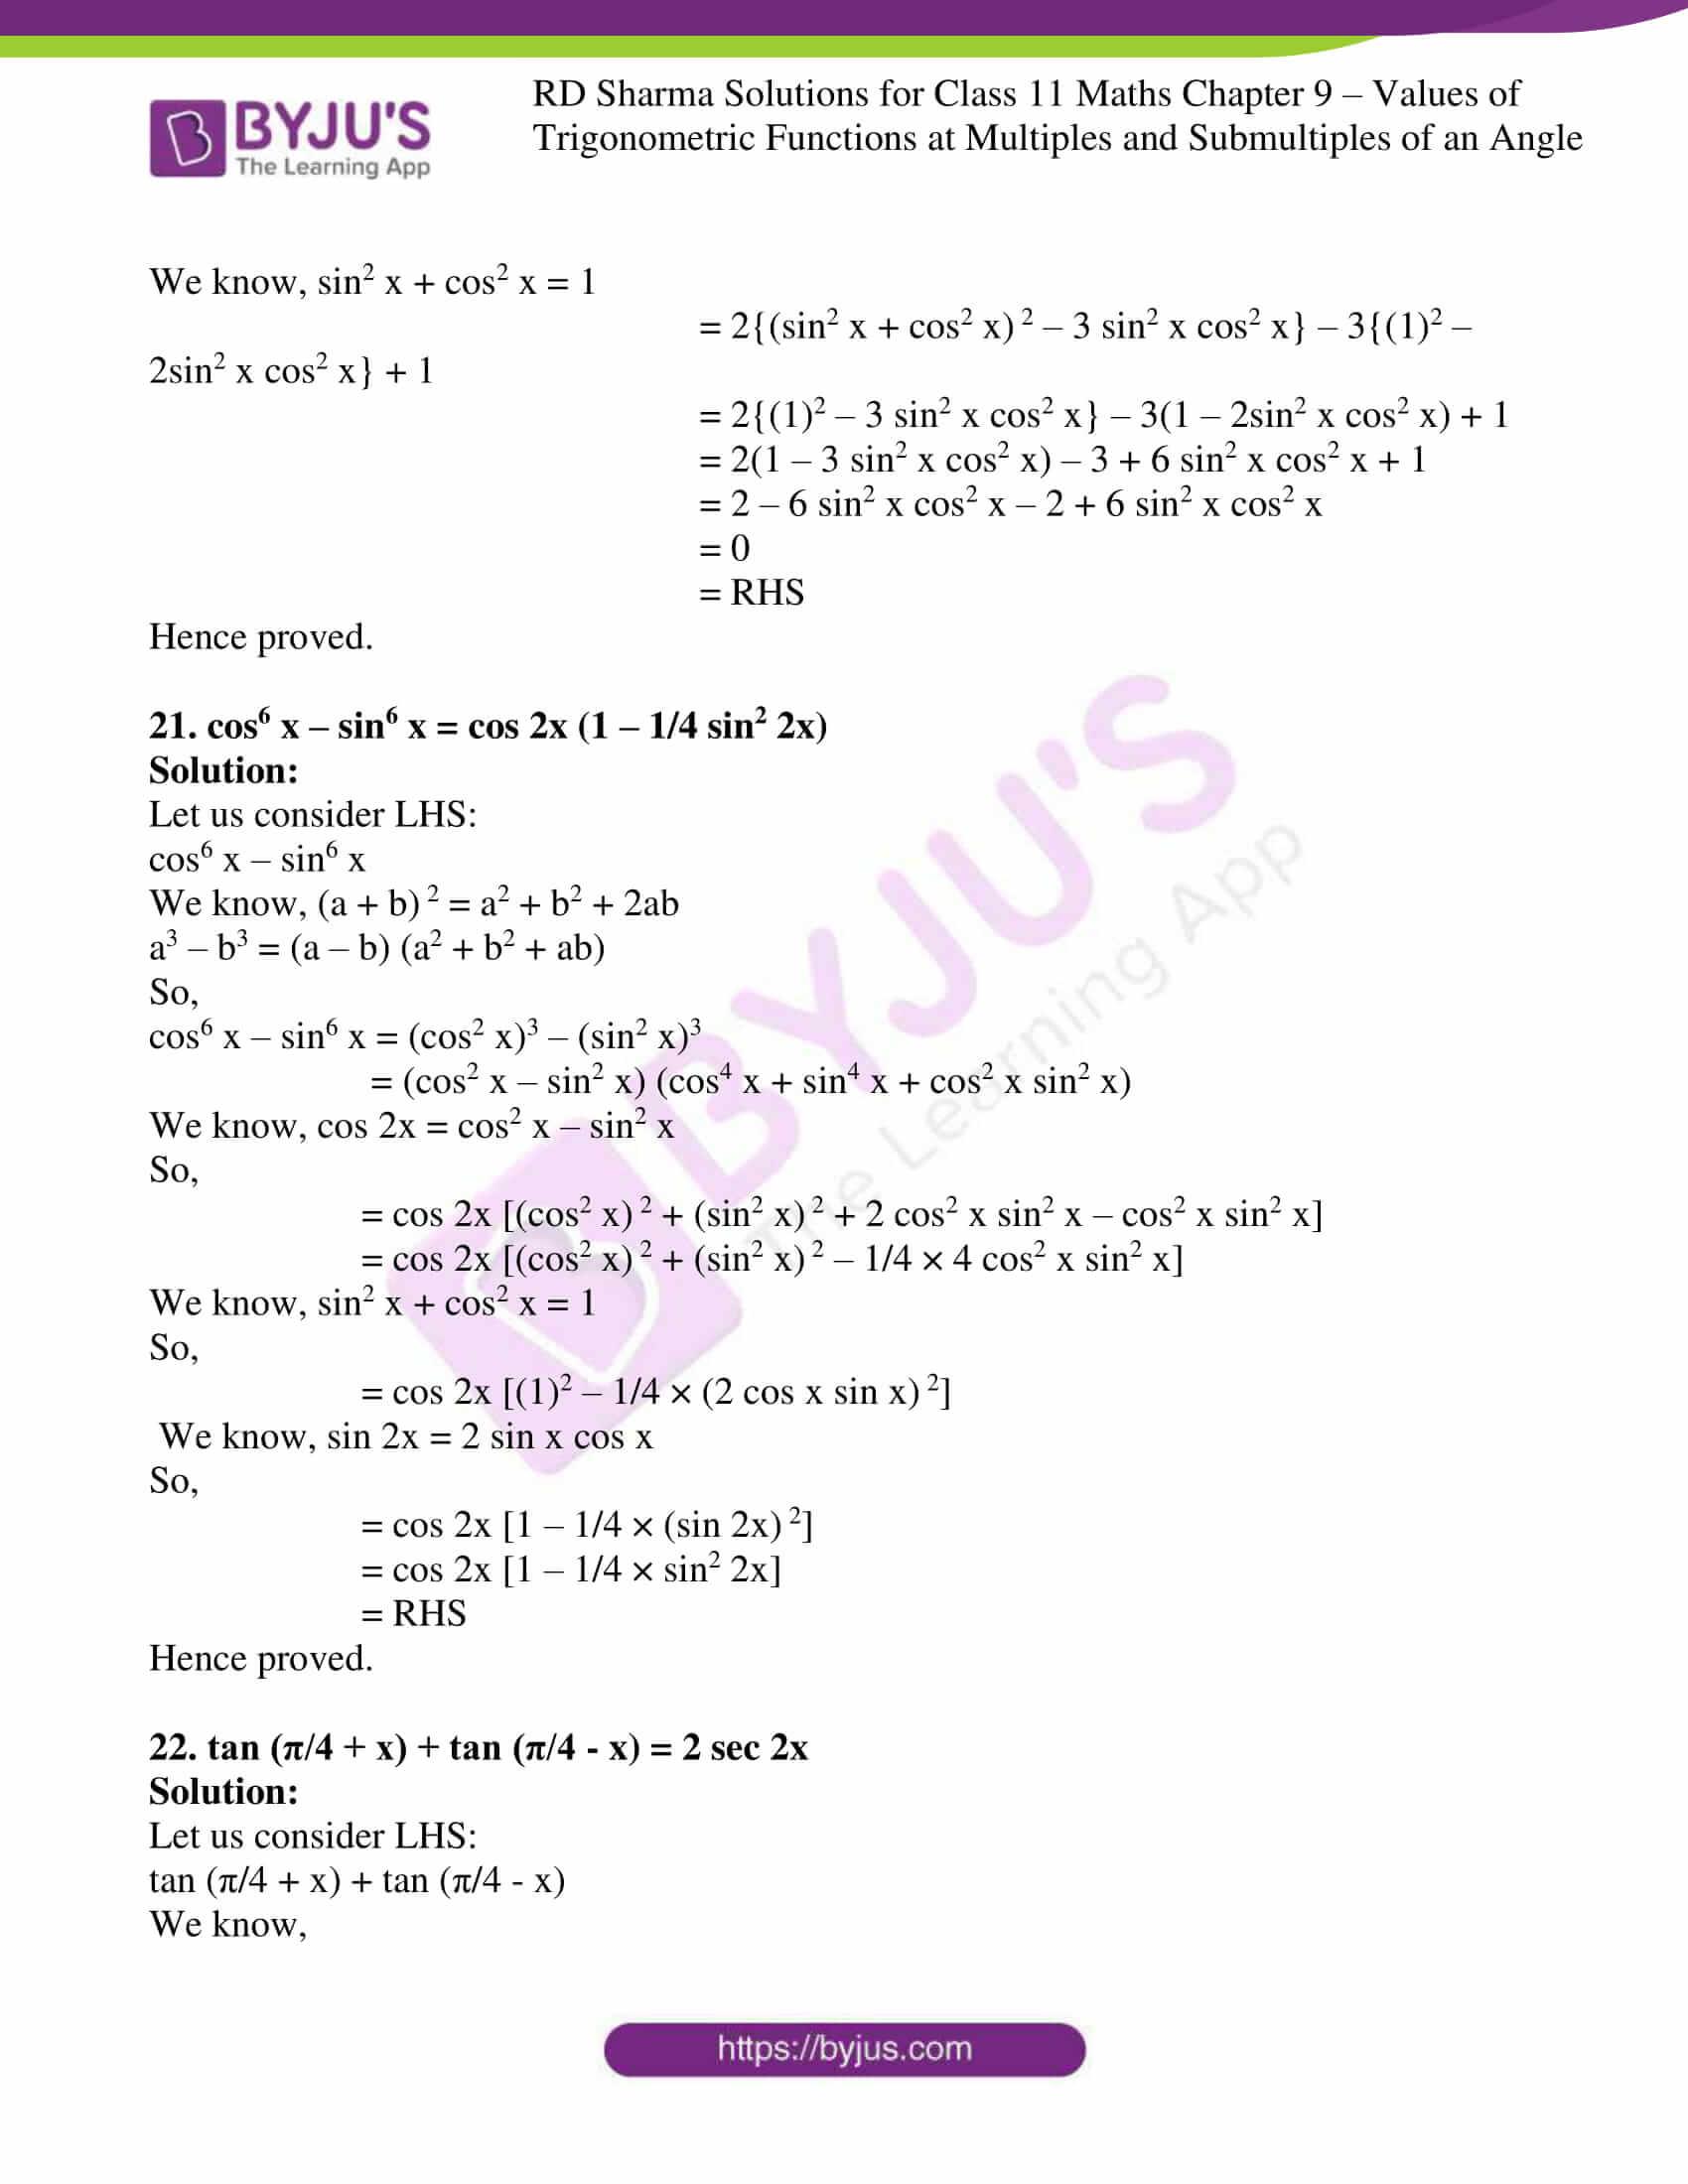 rd sharma class 11 maths ch 9 ex 1 13